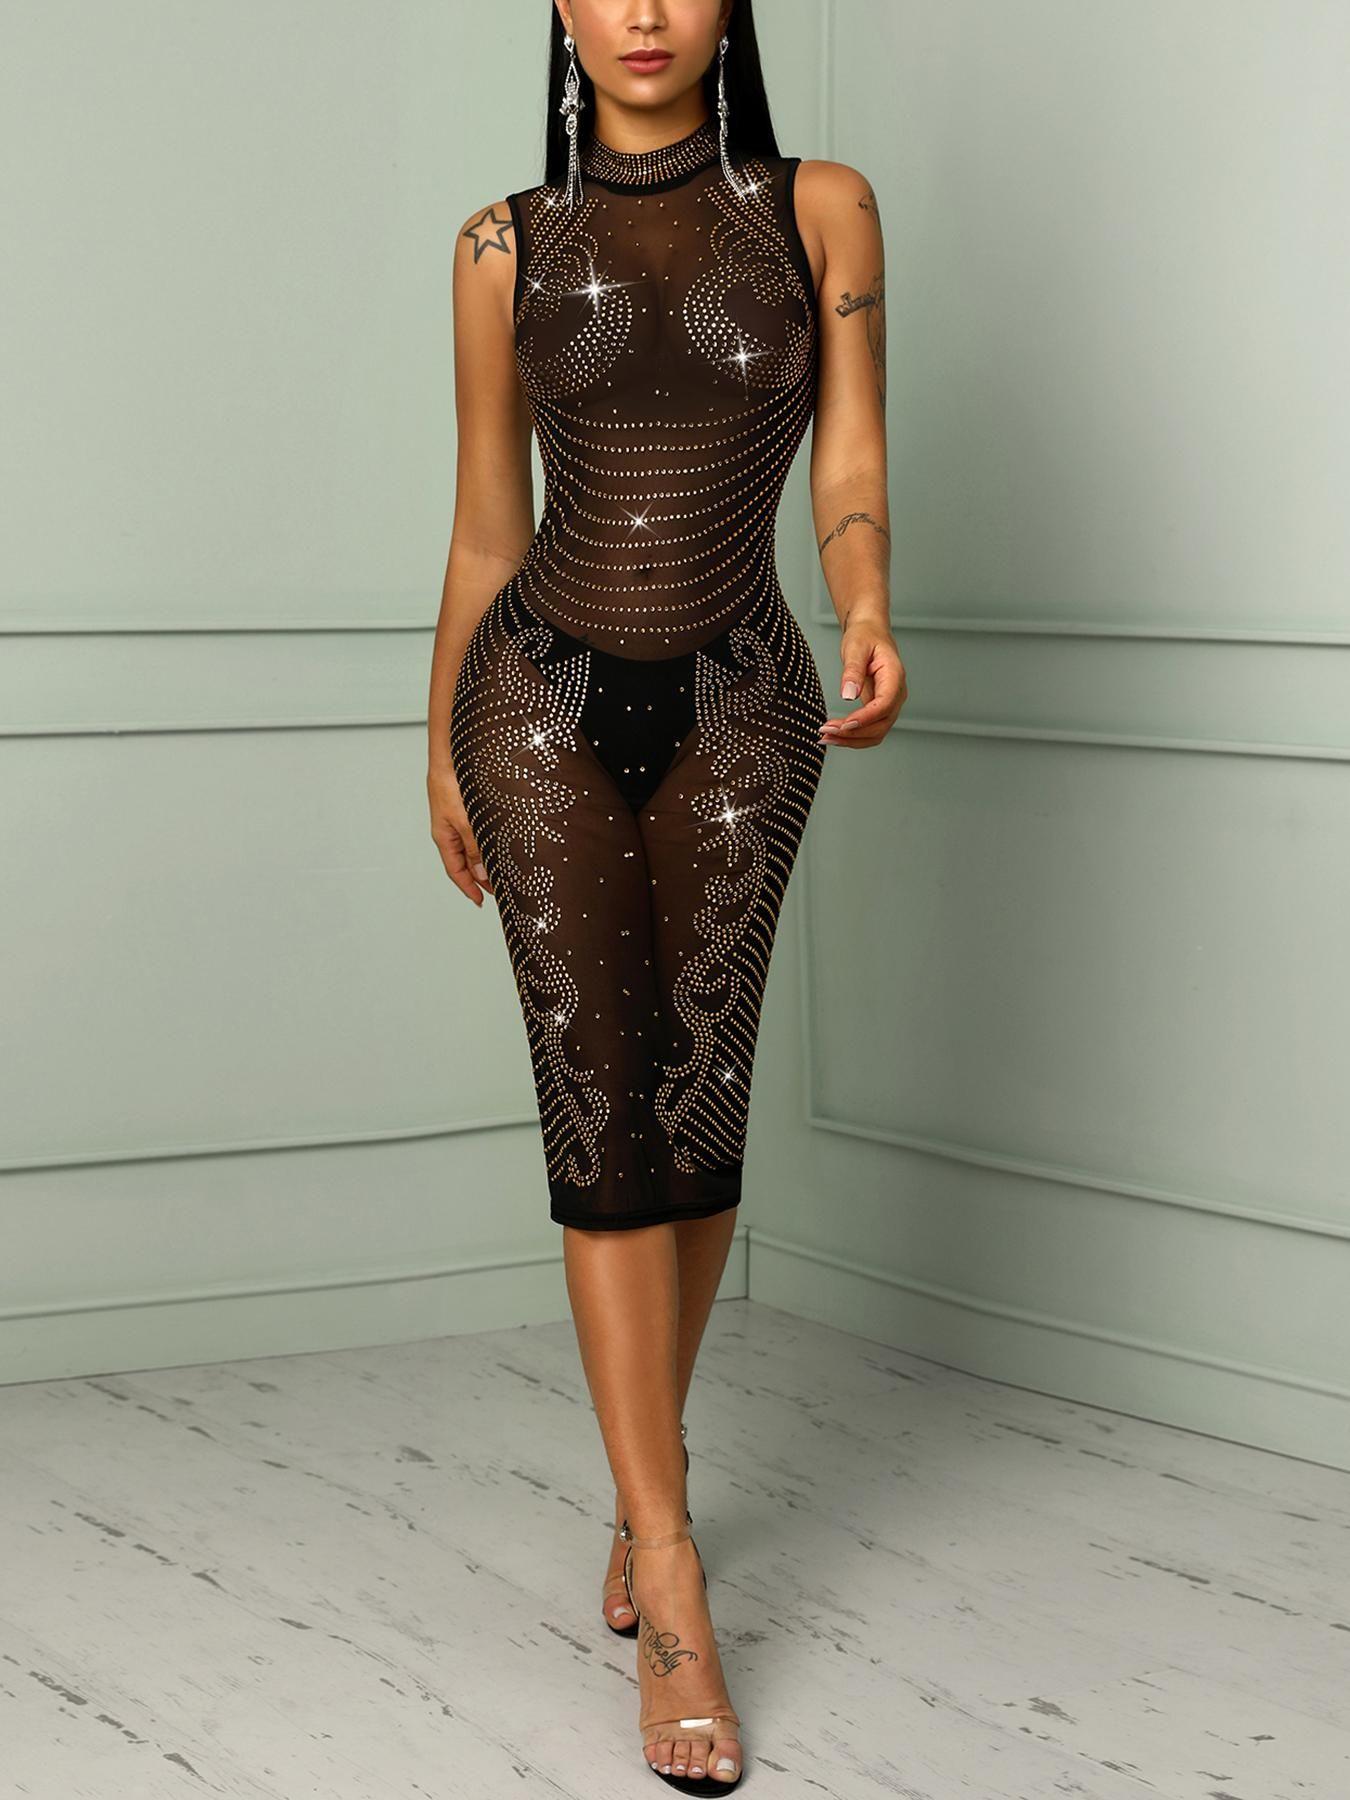 63dc9b5a90ef Shiny Hot Drilling See Through Bodycon Dress #ChicMe:dress fashion Women's  Fashion Online Shopping Chic Me Reviews |women Read Customer Service  #Reviews ...